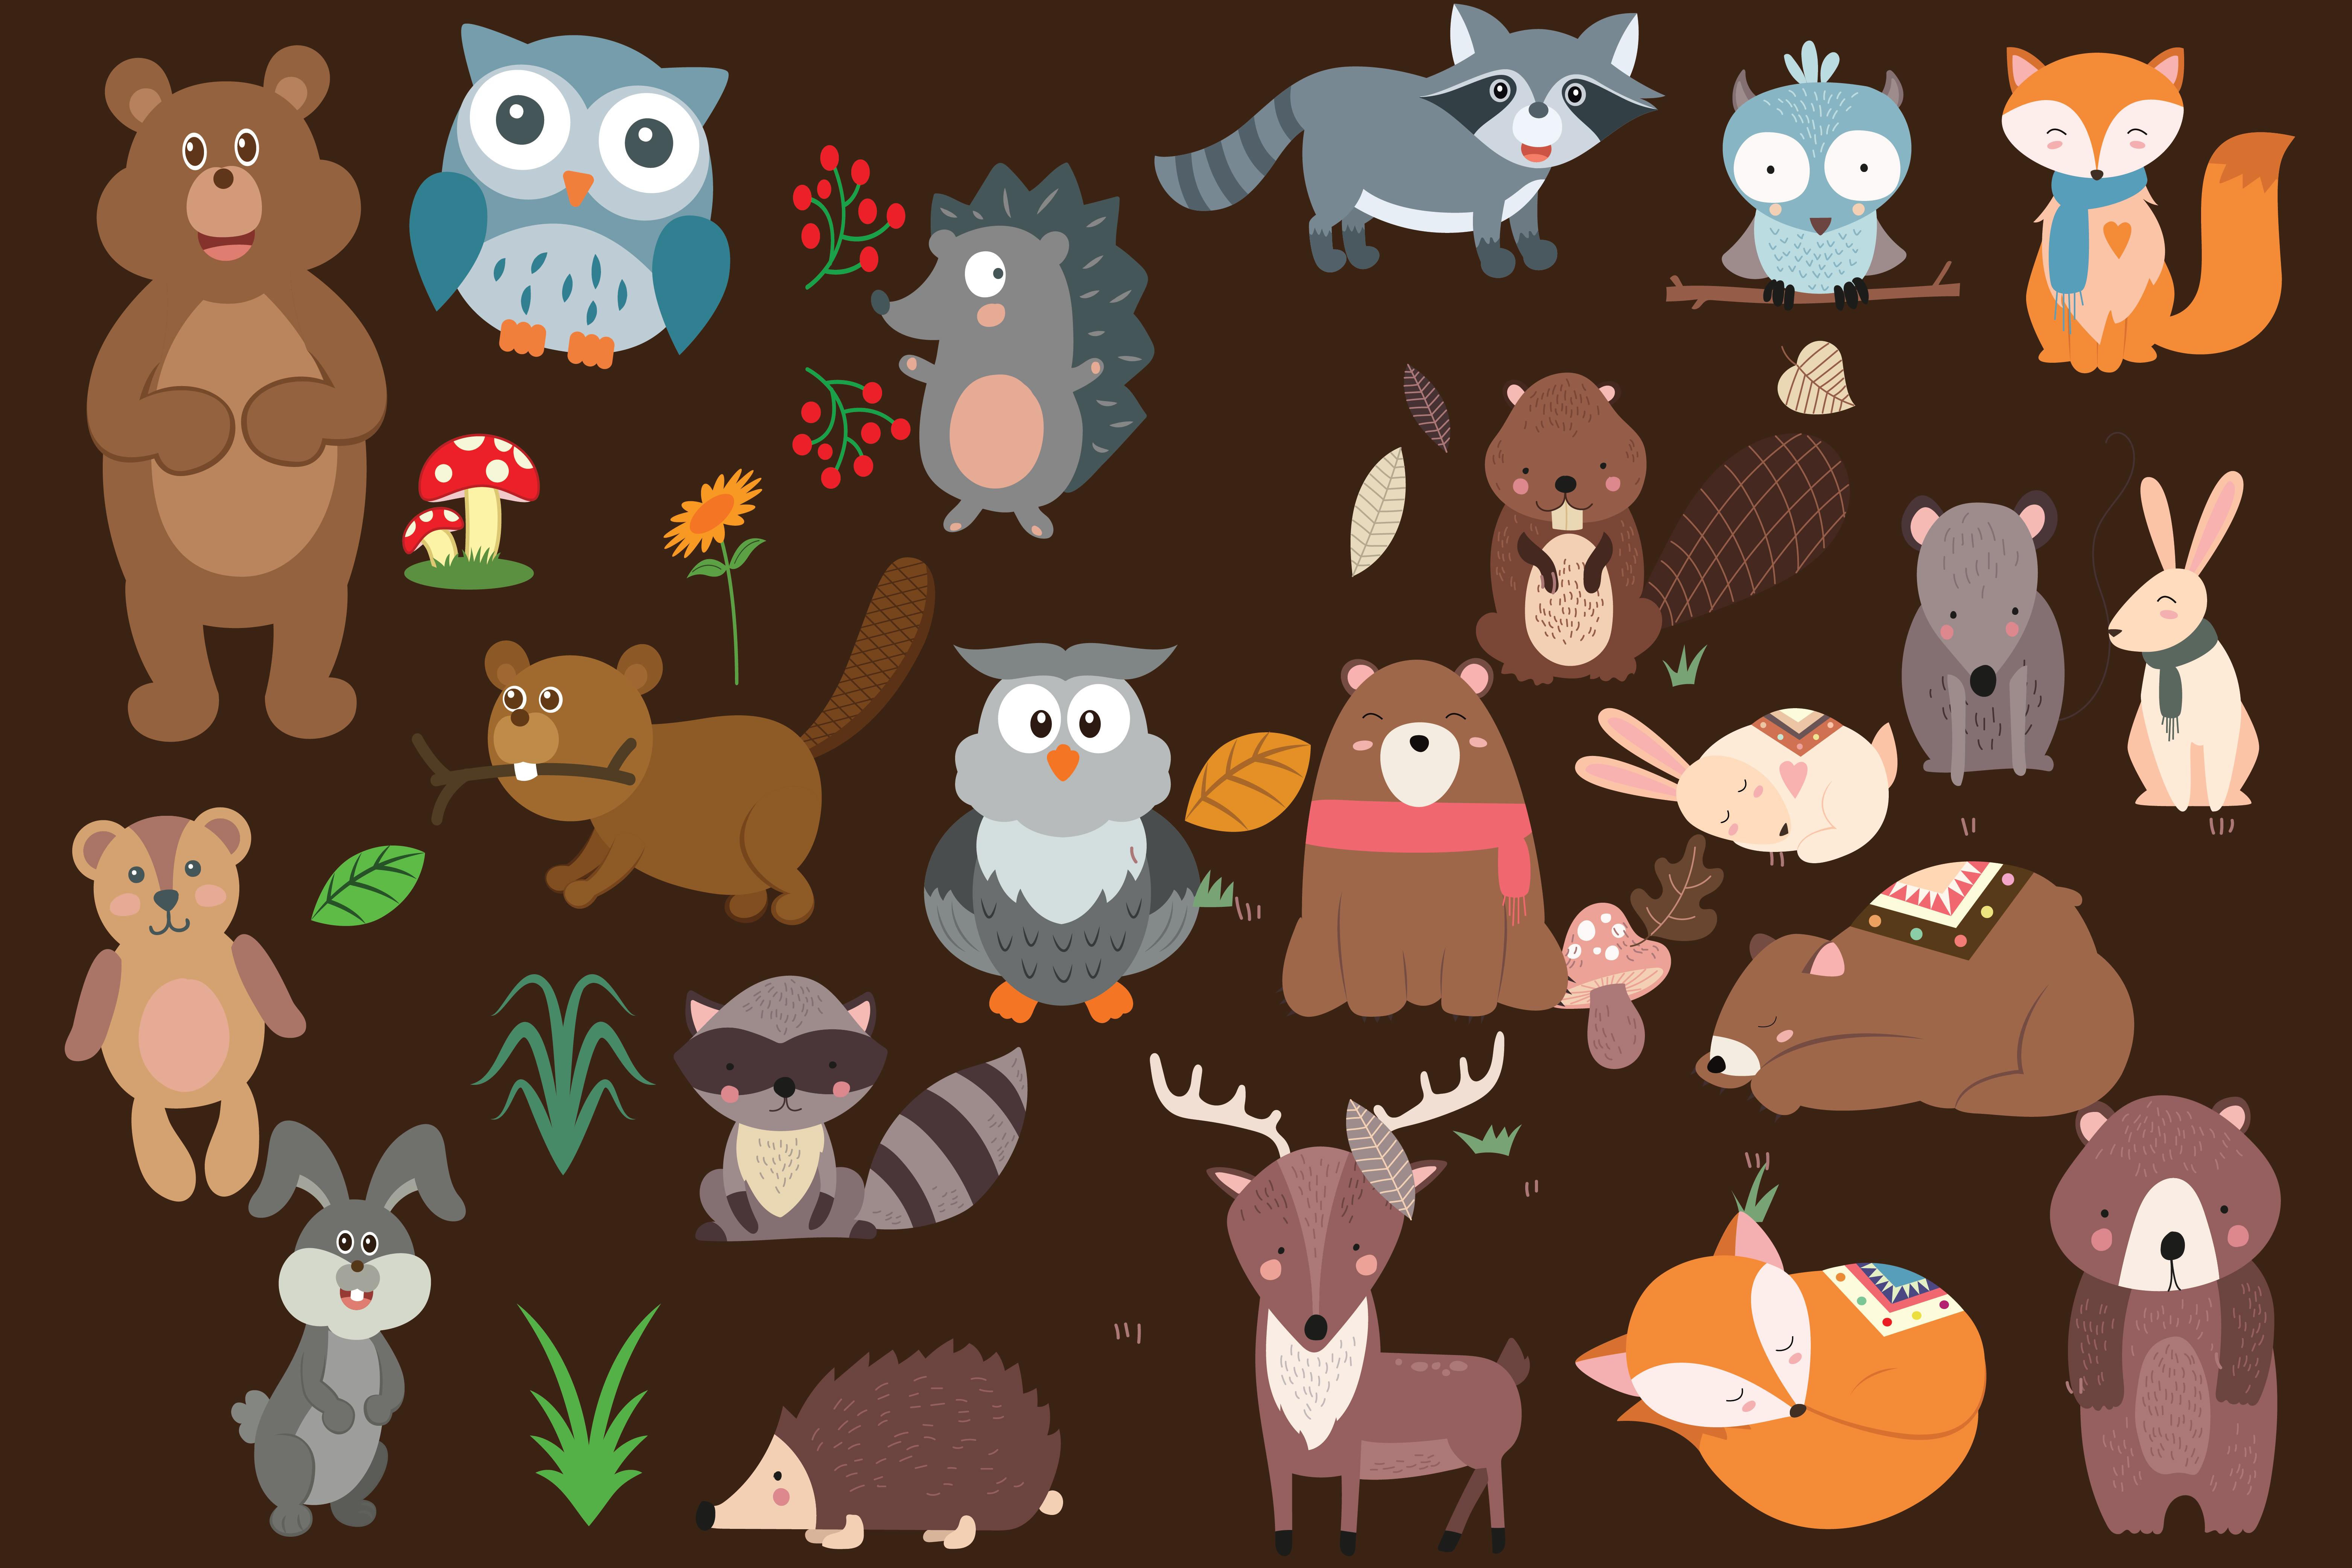 wood land animals,woodland,animals,forest animals,forest,animals,animal,fox,owl,bear example image 3